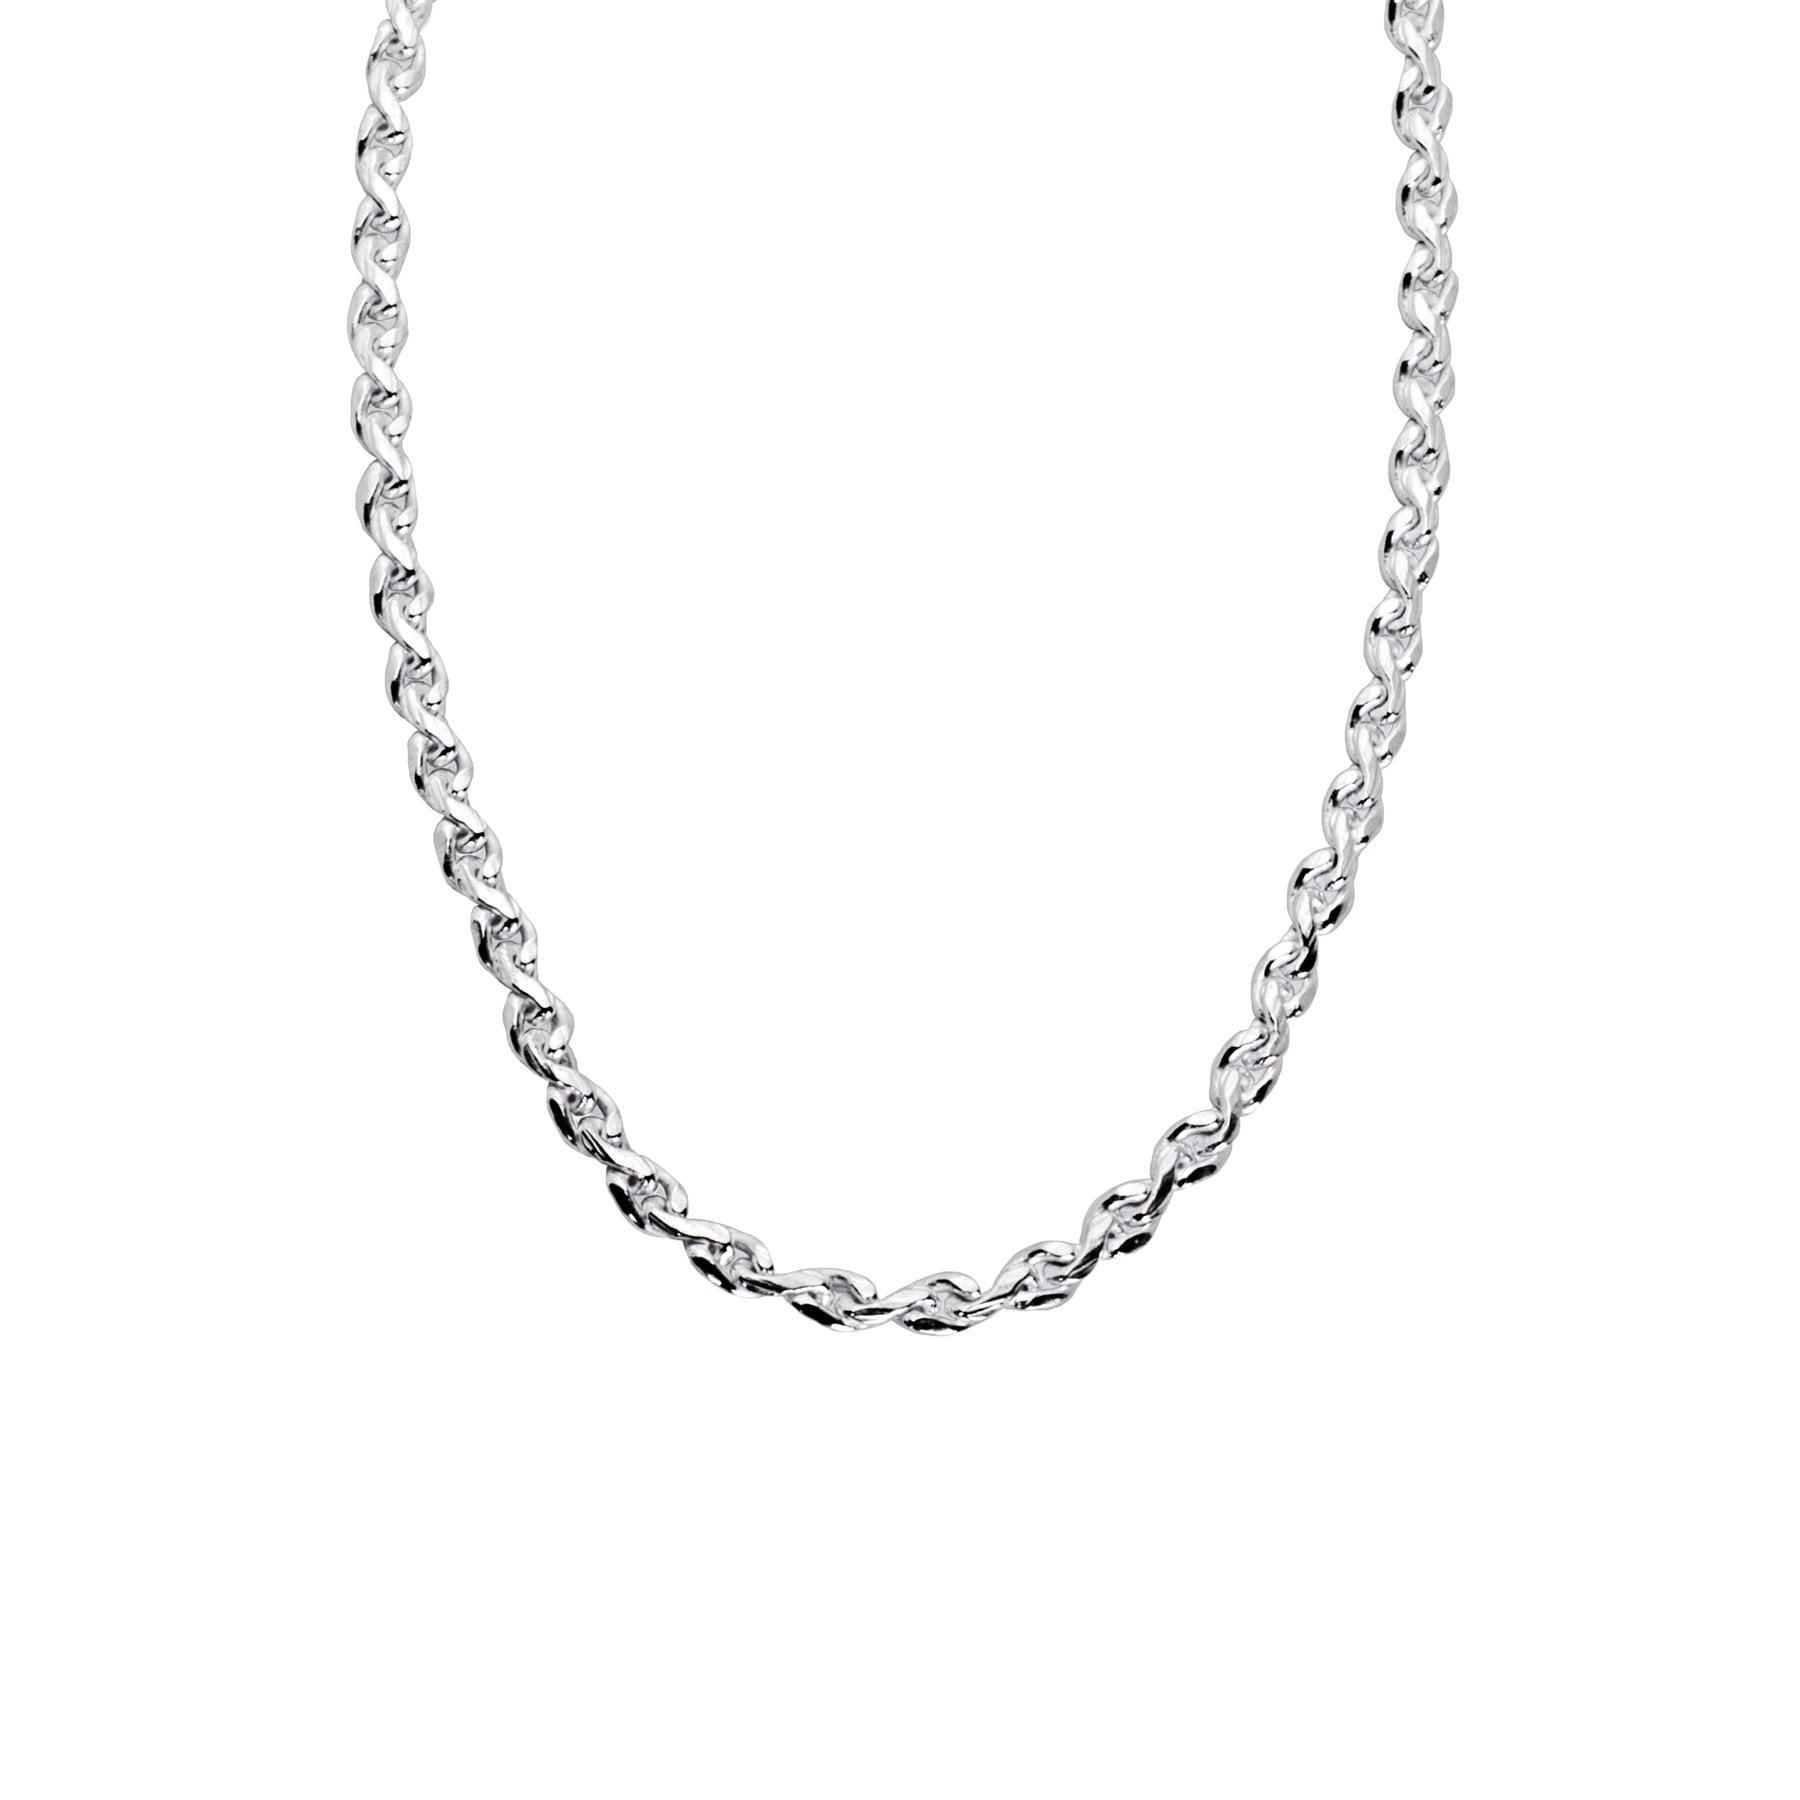 Silver Steel Chain